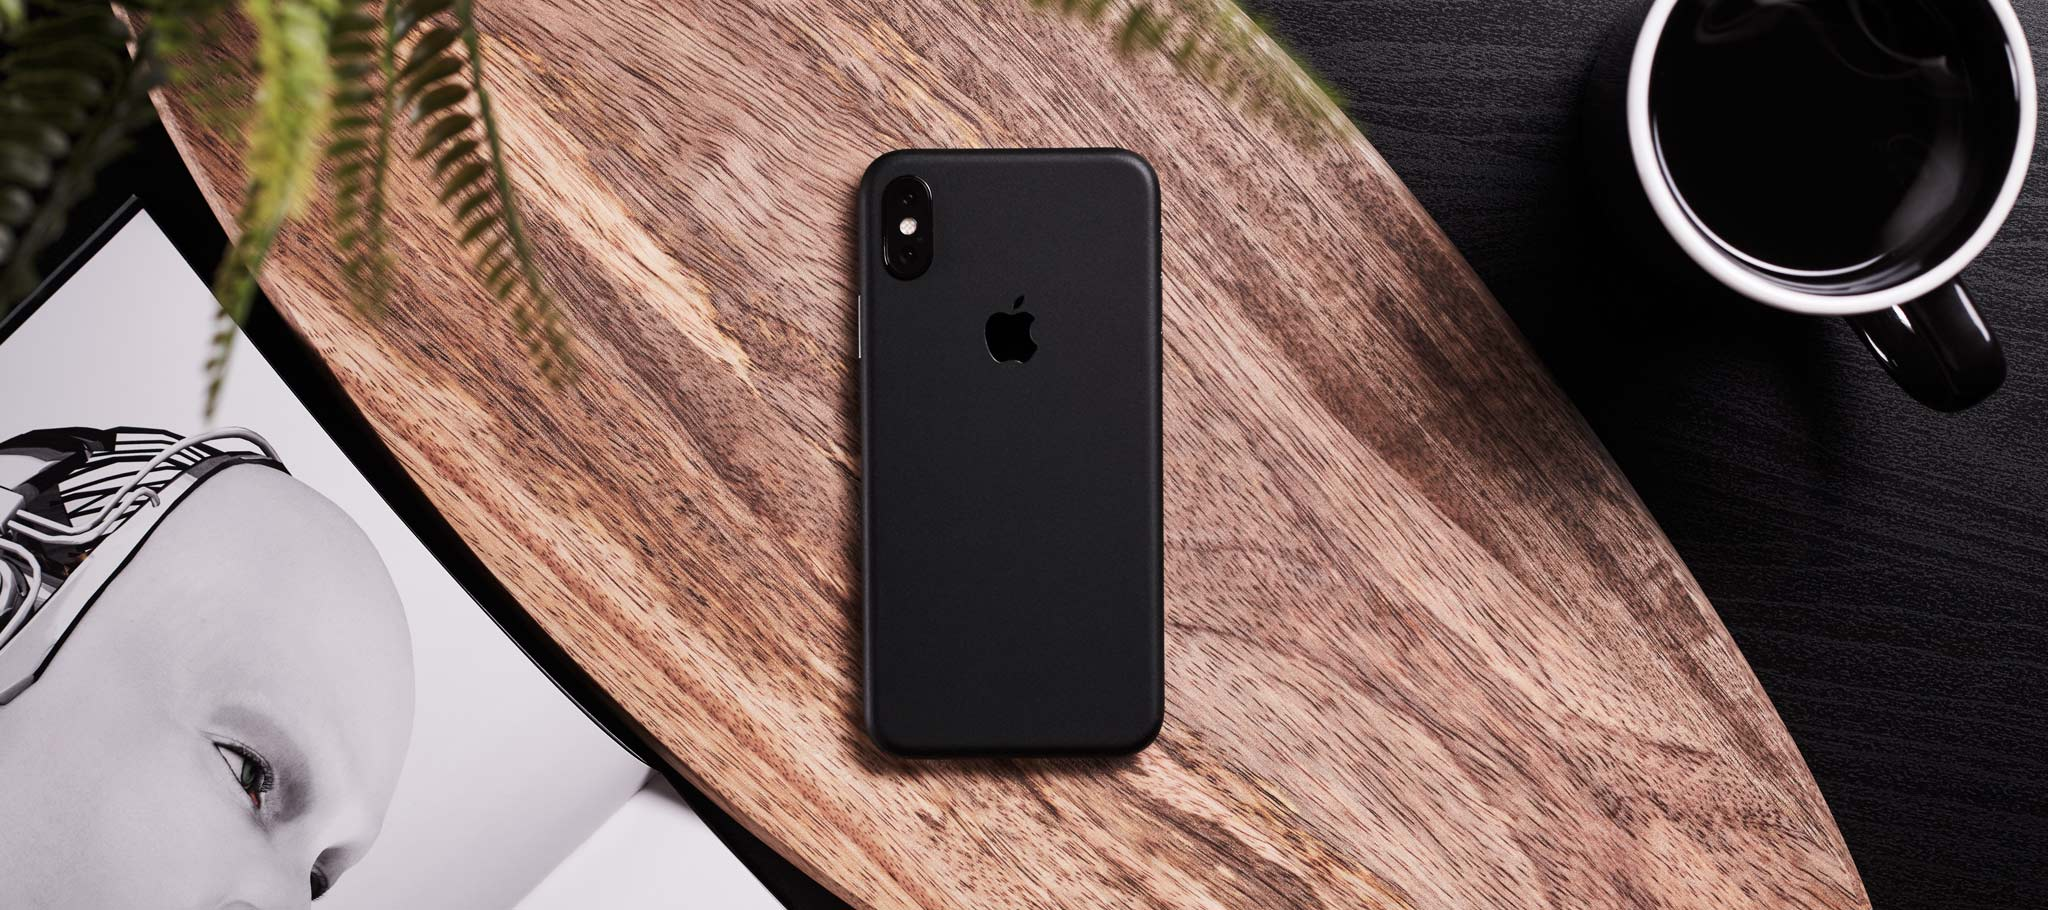 matte-black-iphone-xs-max-skins